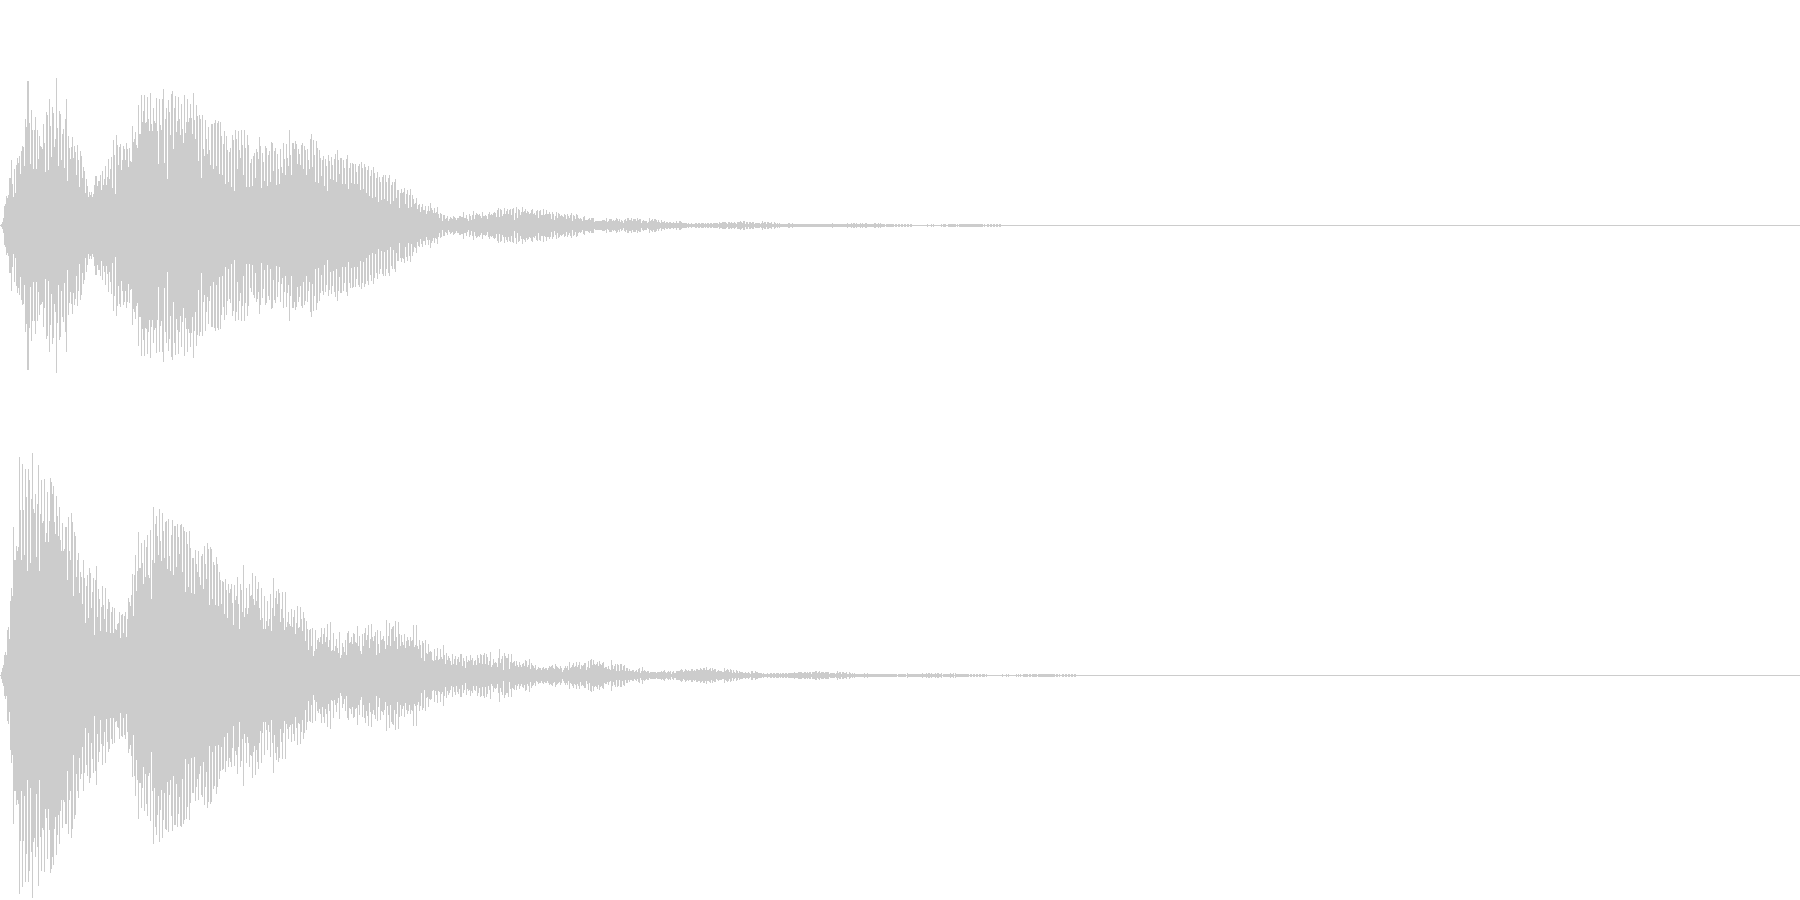 SF CinemaFX ダークなサウンドの未再生の波形